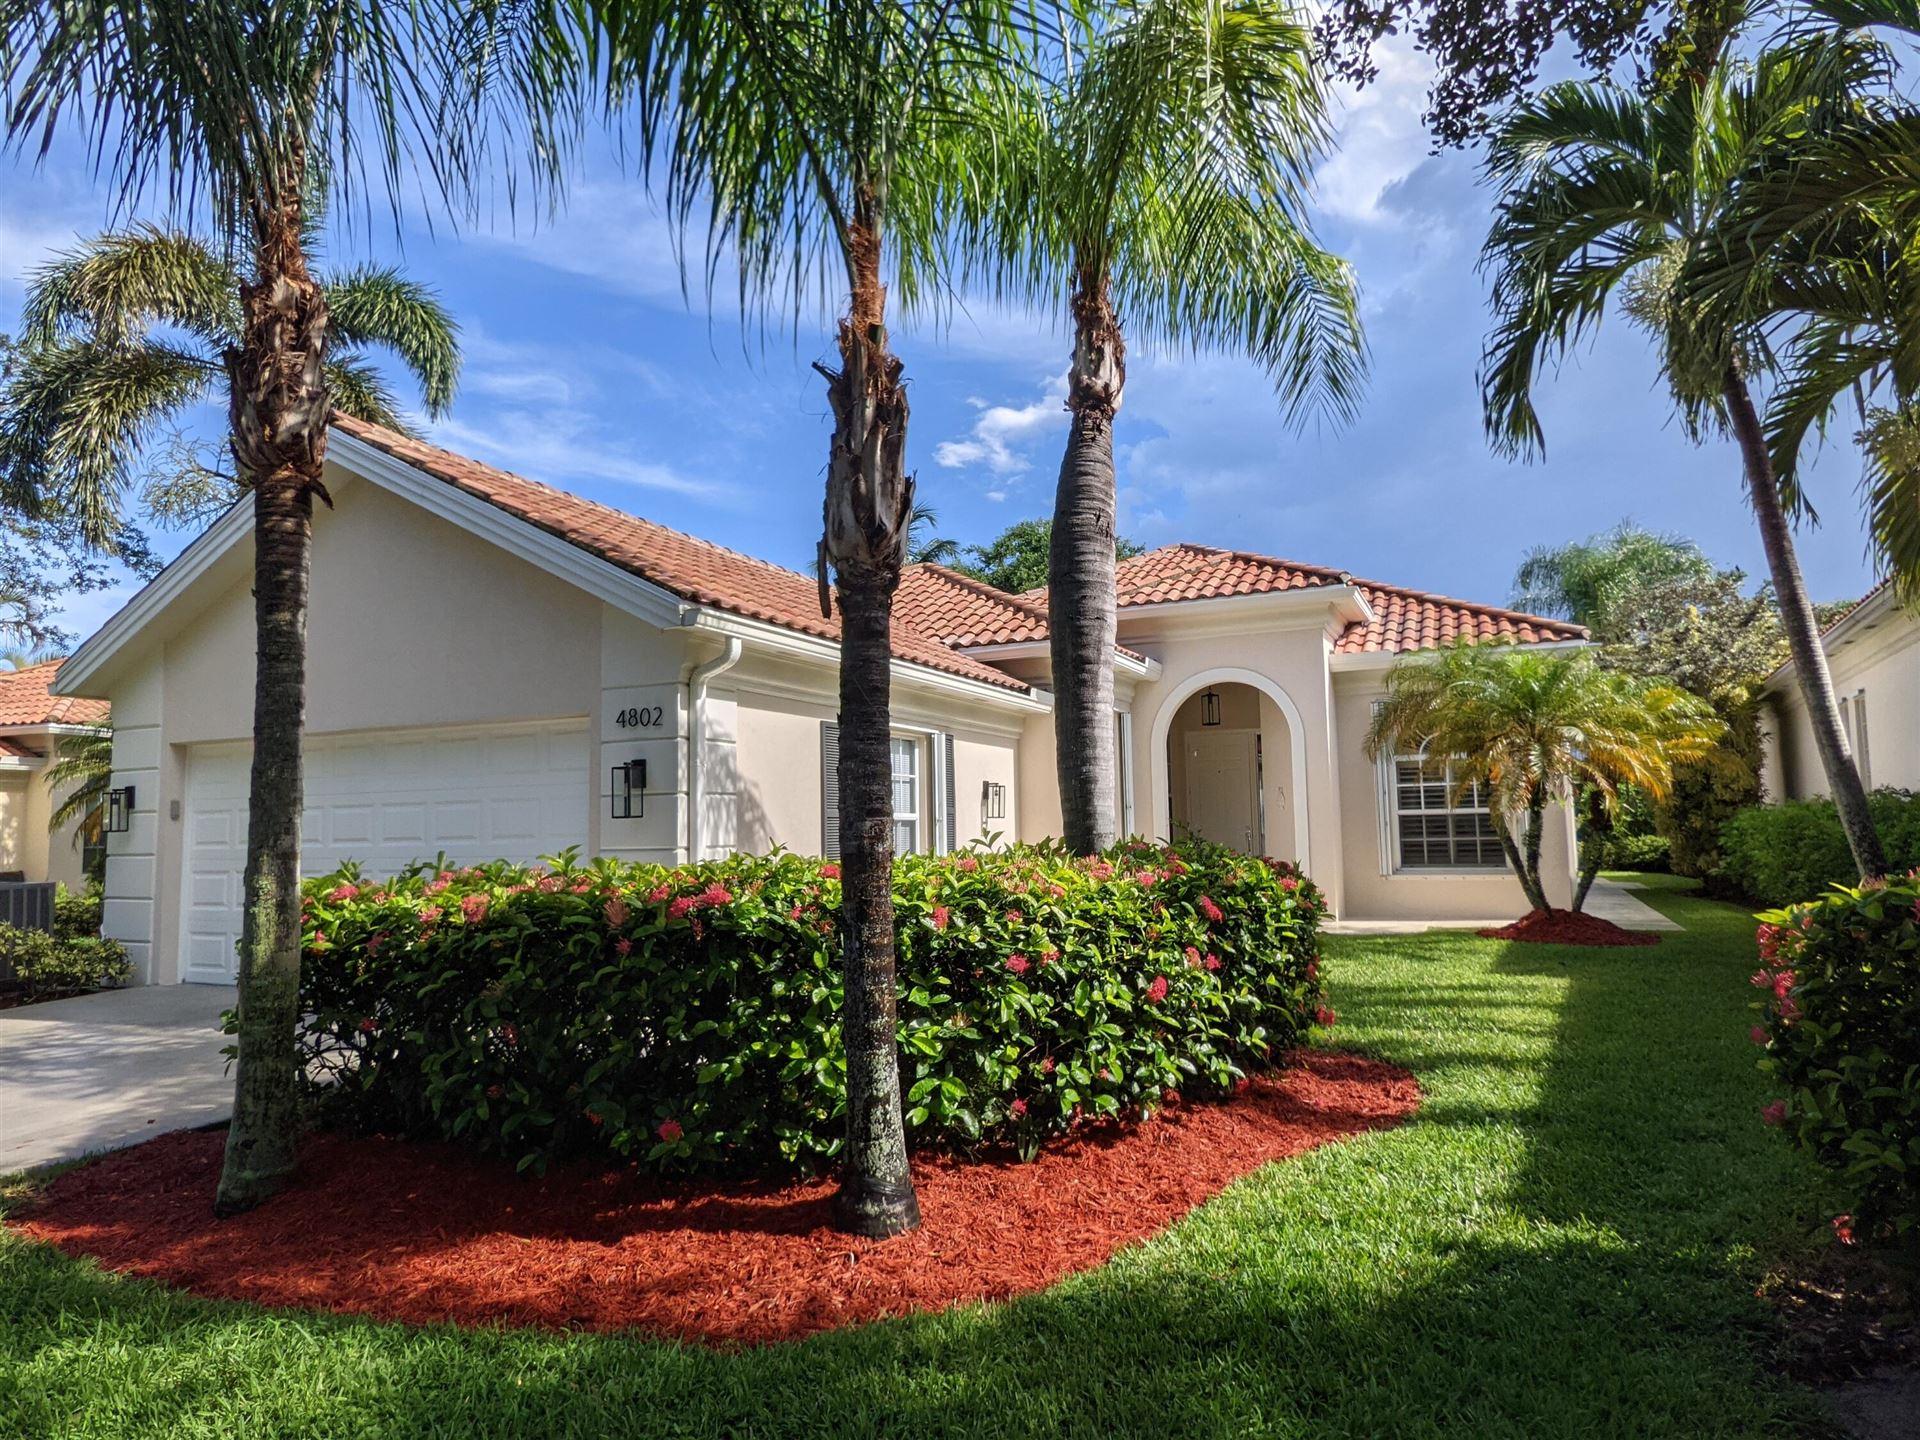 4802 Orchard Lane, Delray Beach, FL 33445 - MLS#: RX-10734683